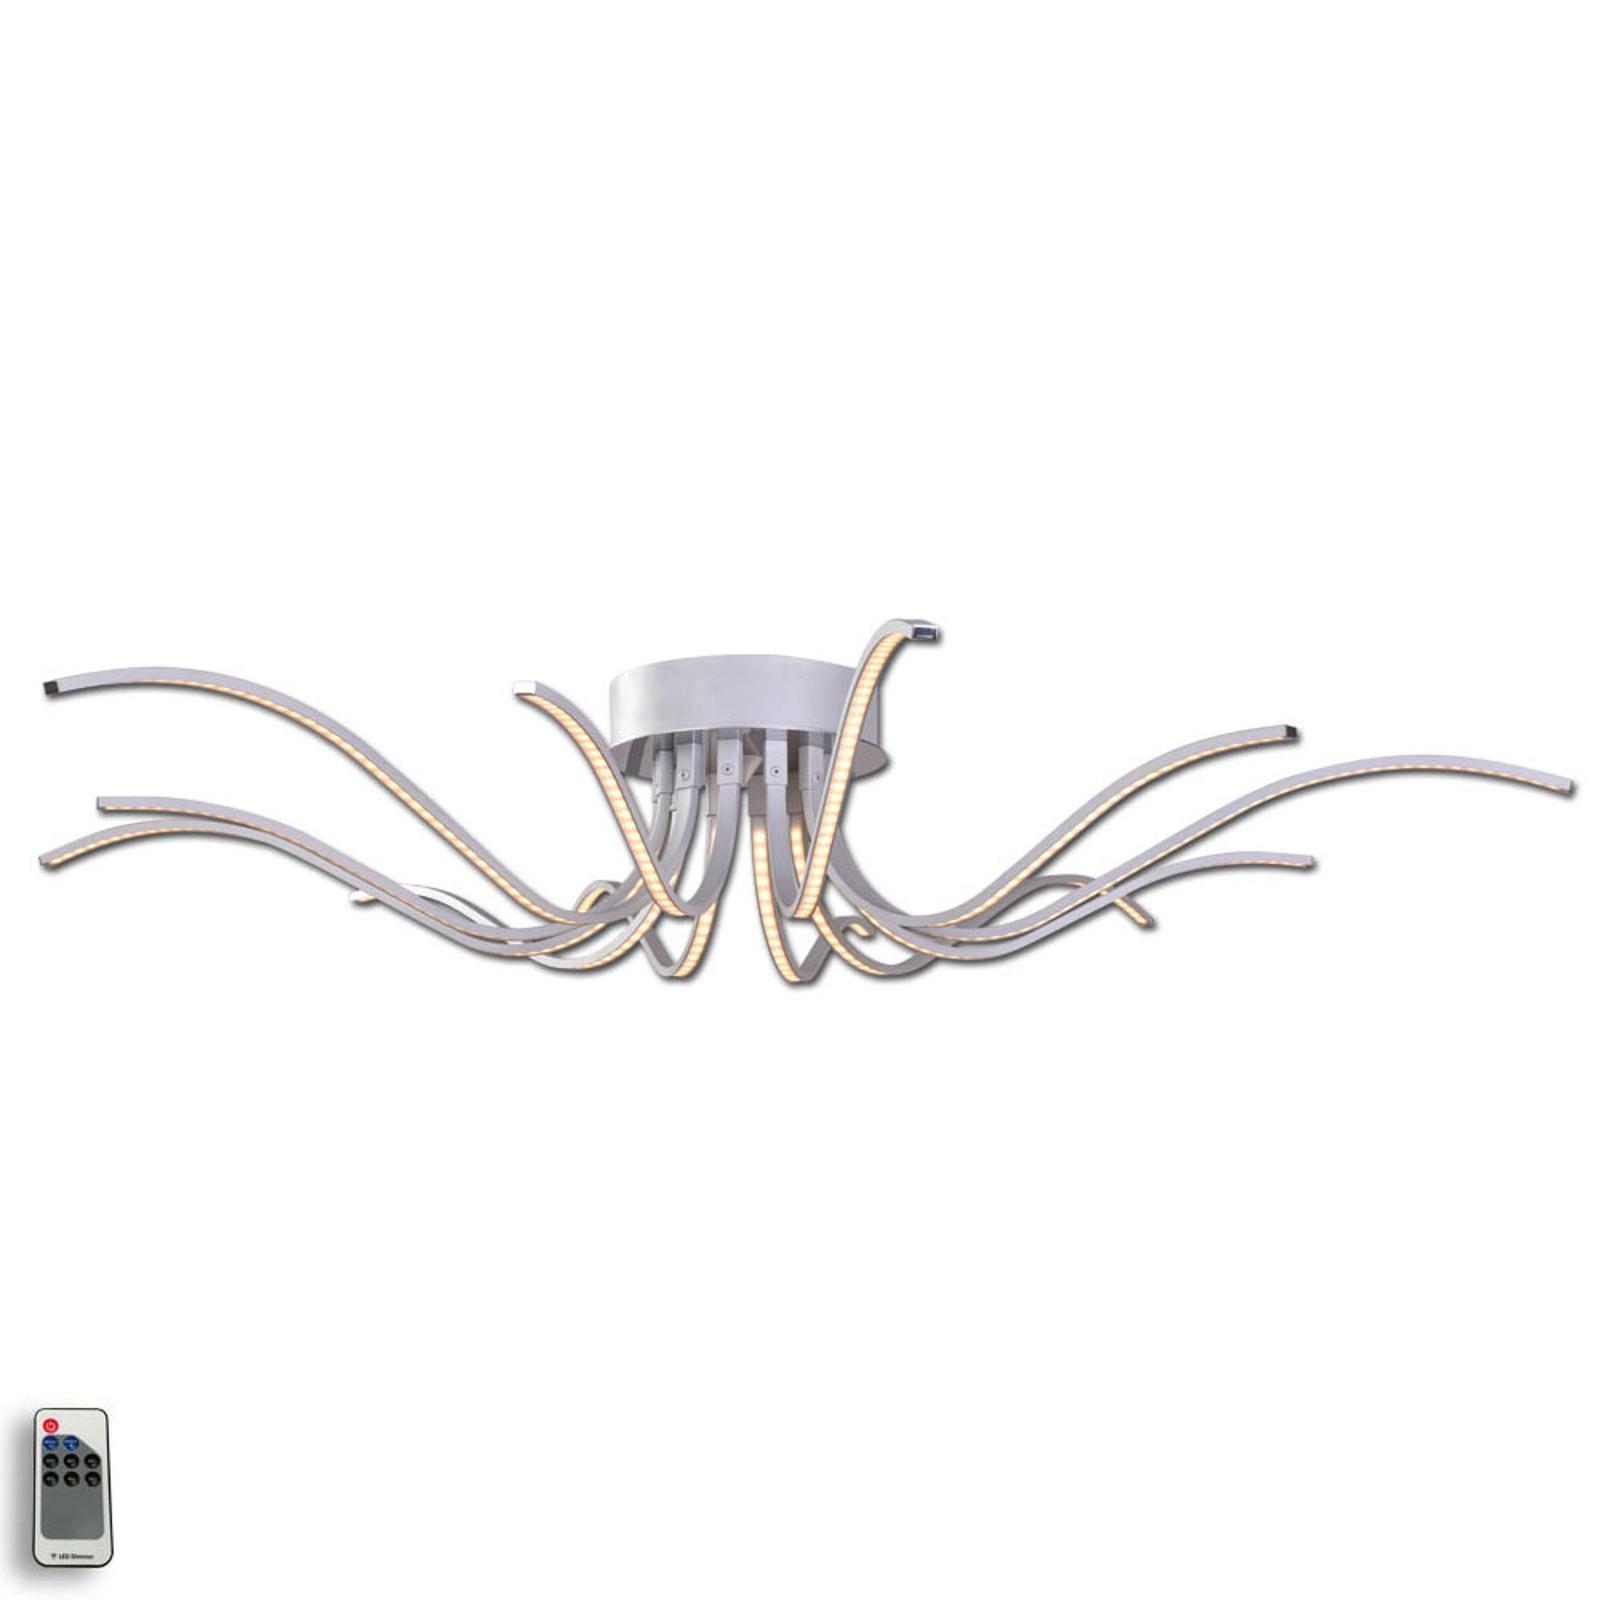 Zachwycająca lampa sufitowa LED Lumenos, aluminium